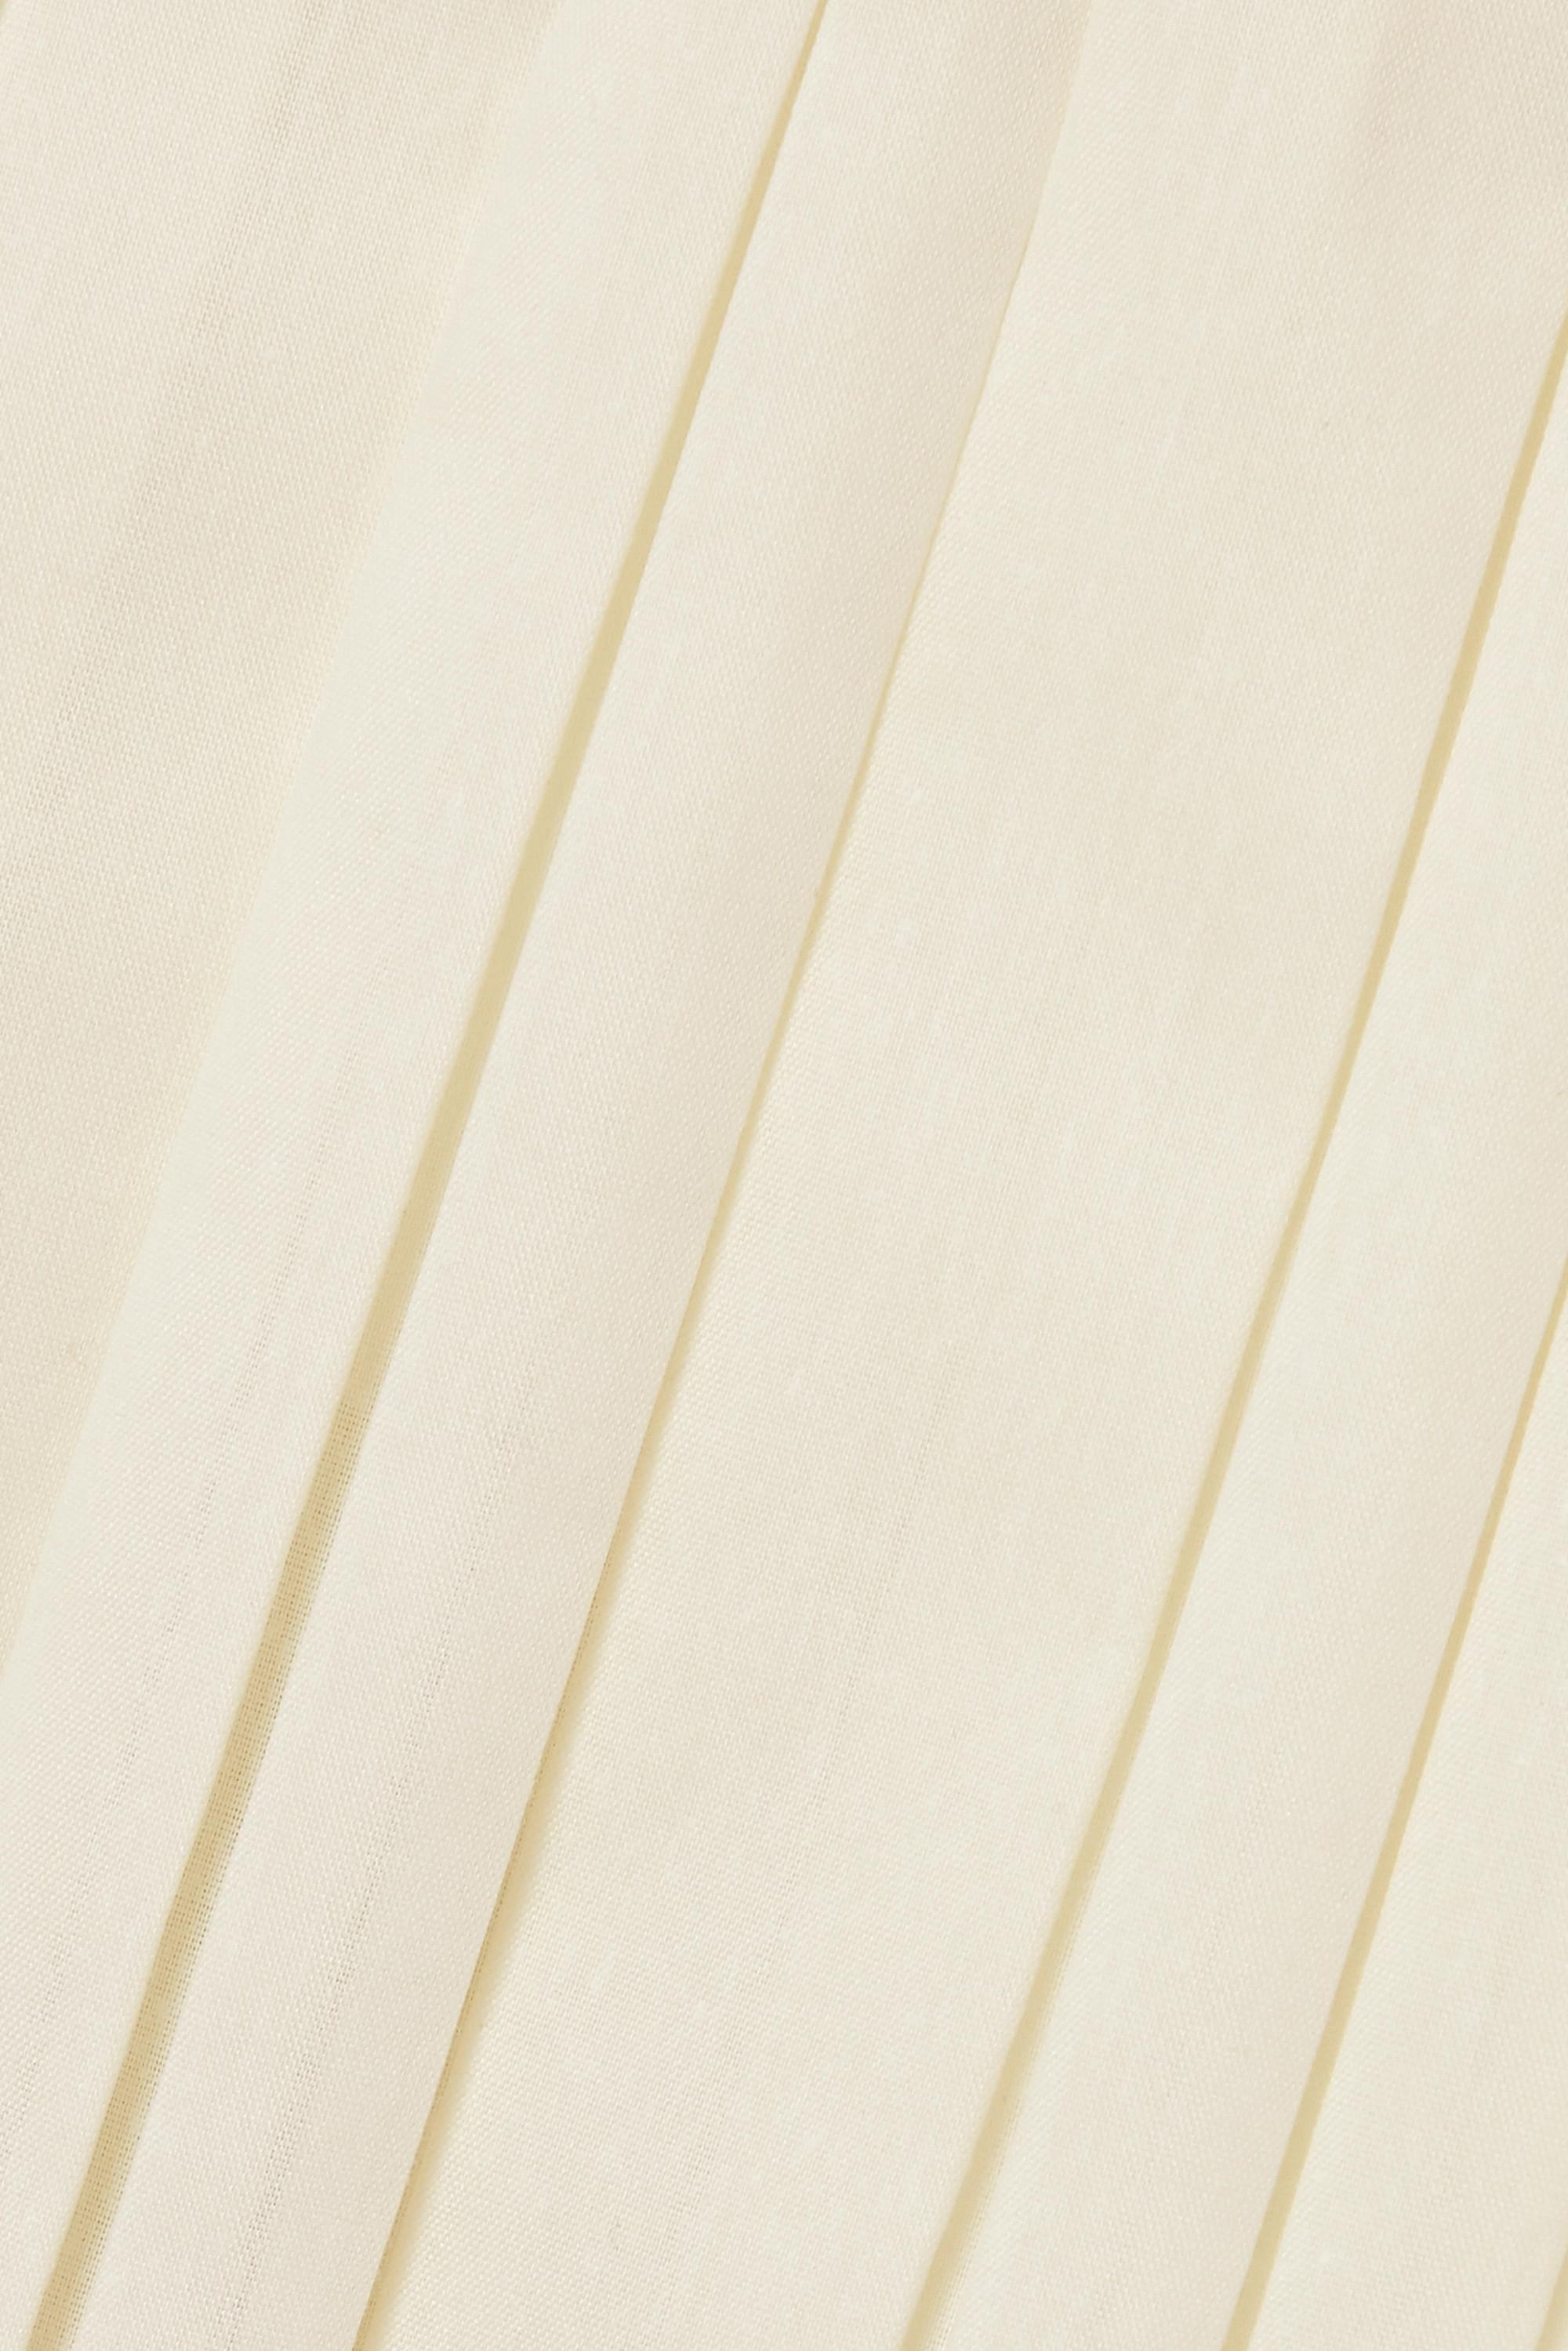 The Row Jupe midi plissée en crêpe Magdita